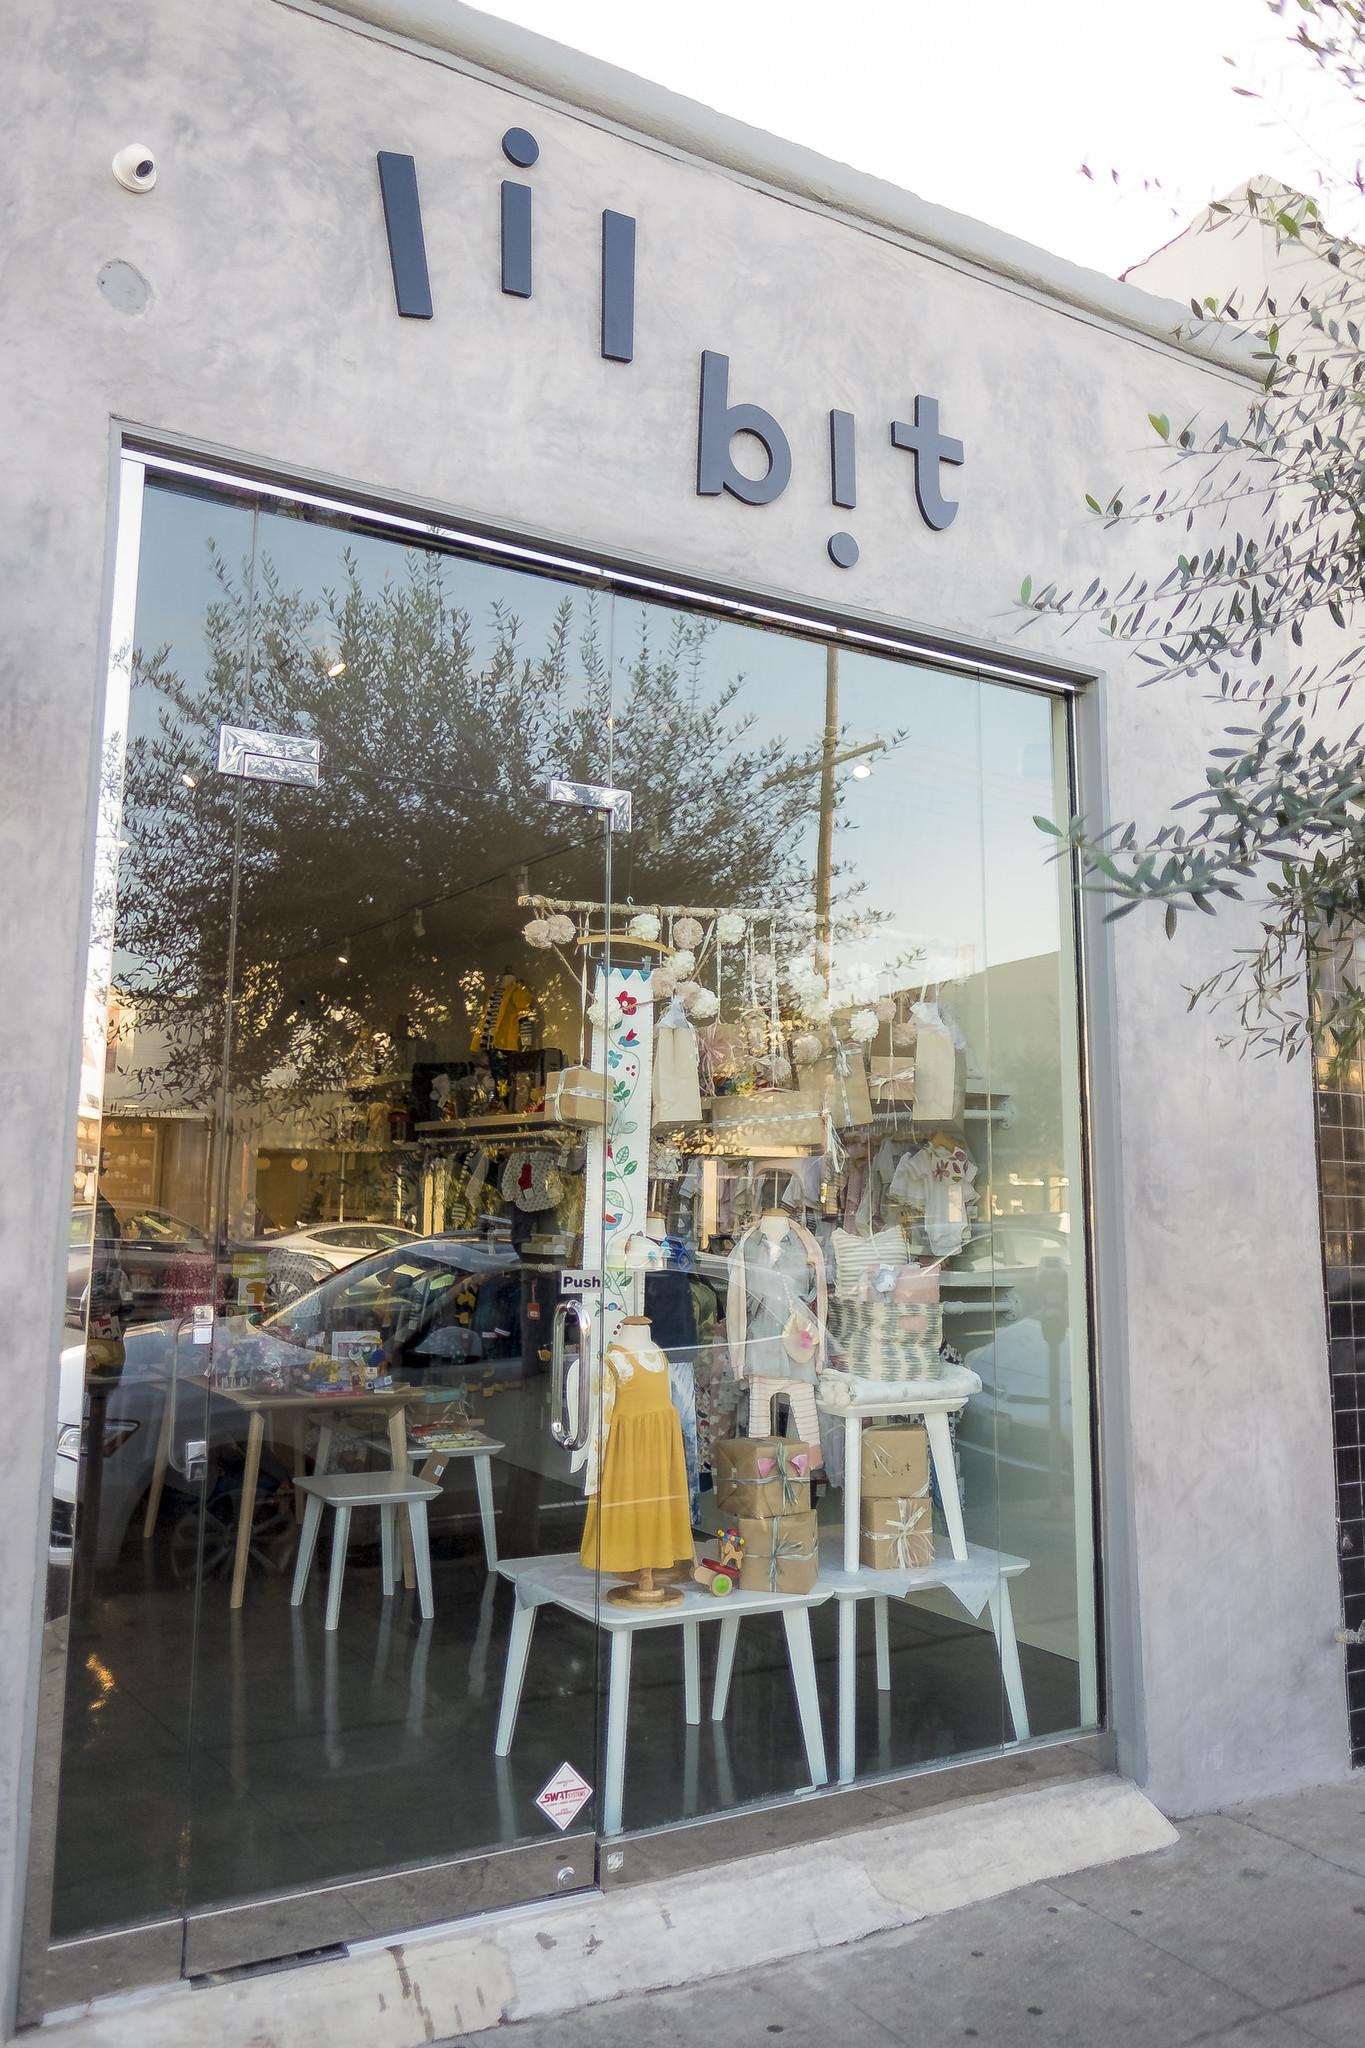 Children's store Lil Bit is on West 3rd Street in Los Angeles.